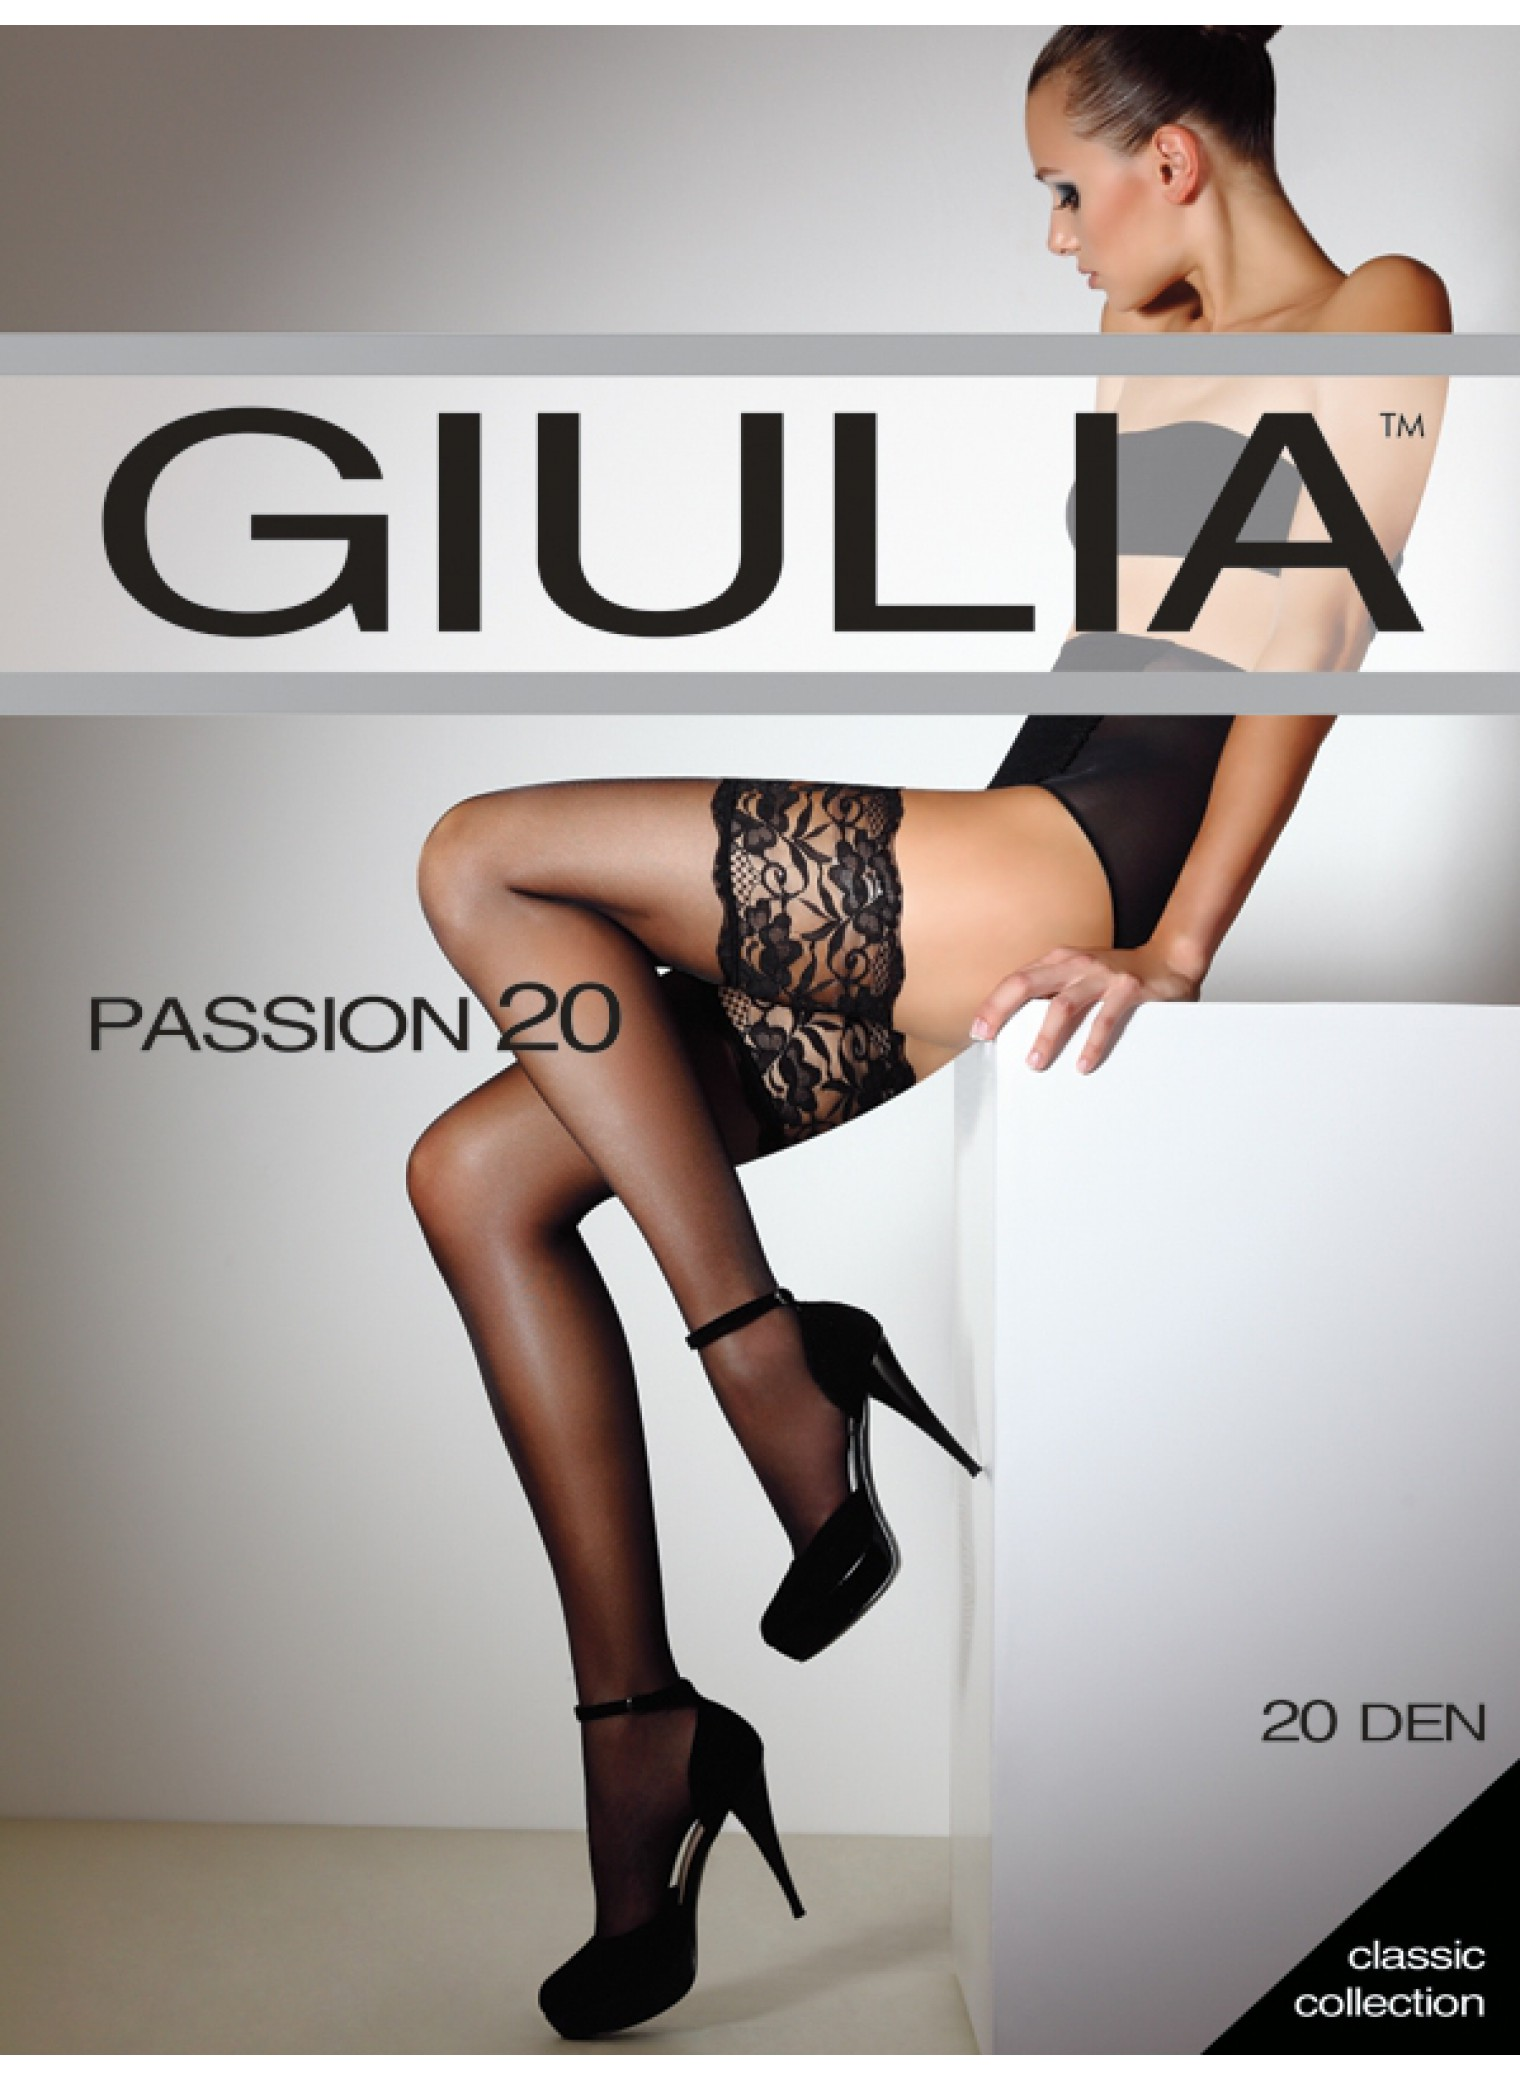 Чулки Passion 20